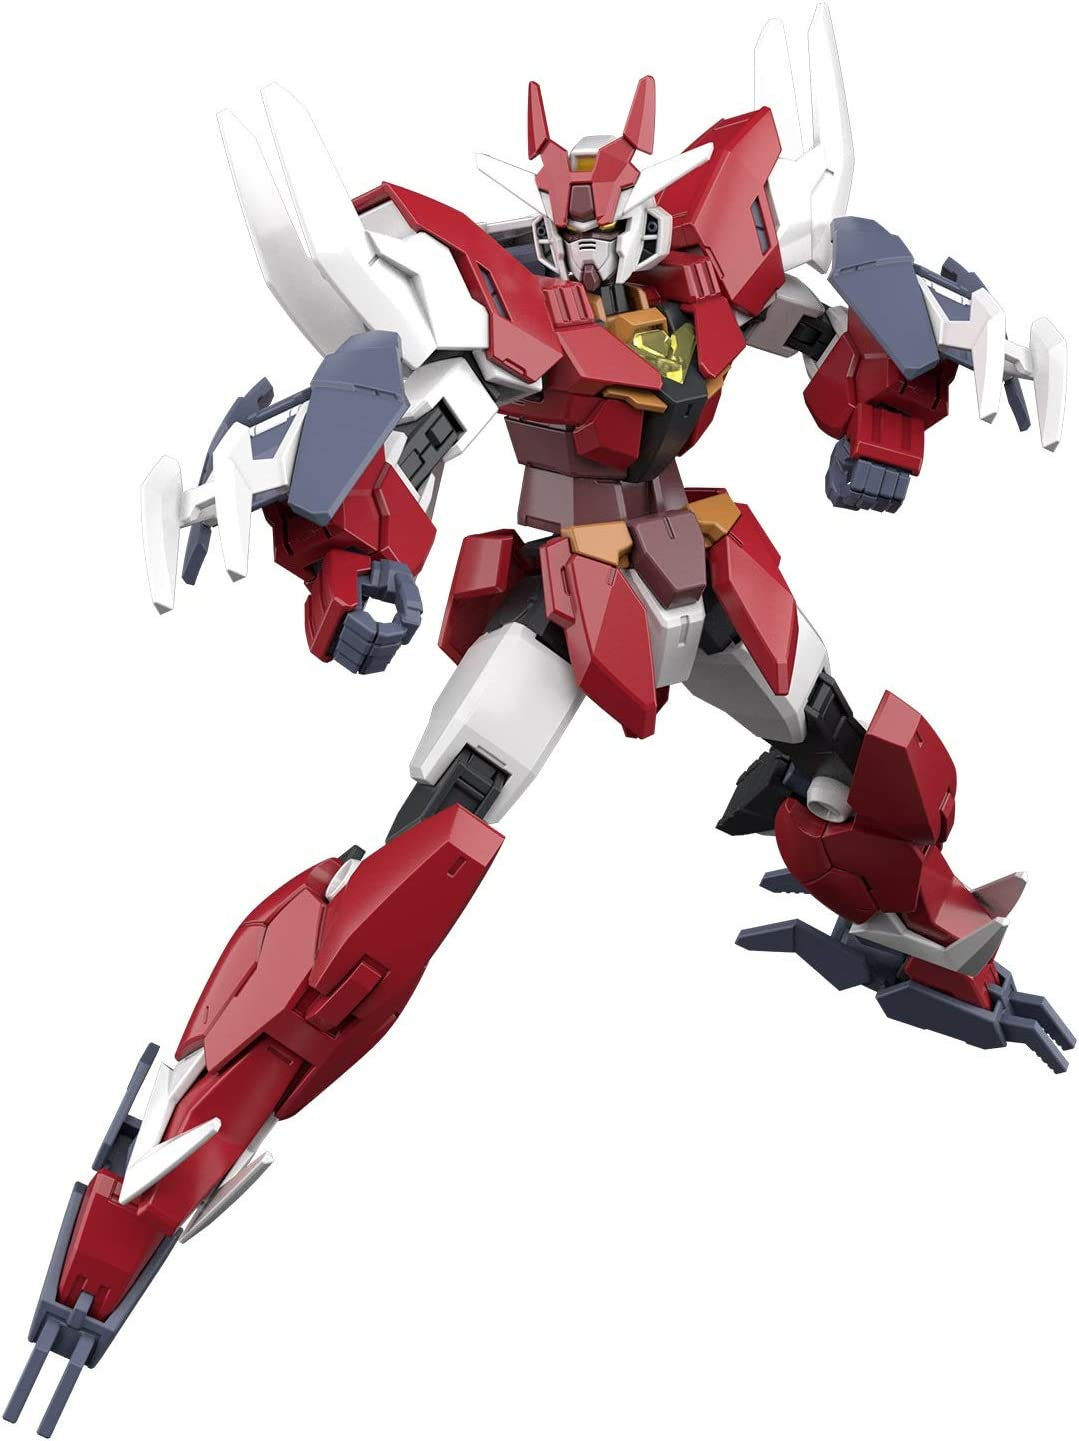 Gundam Build Divers RE:Rise #08 Core Gundam (Real Type Color) &Marsfour Unit, Bandai Spirits HGBD:R 1/144